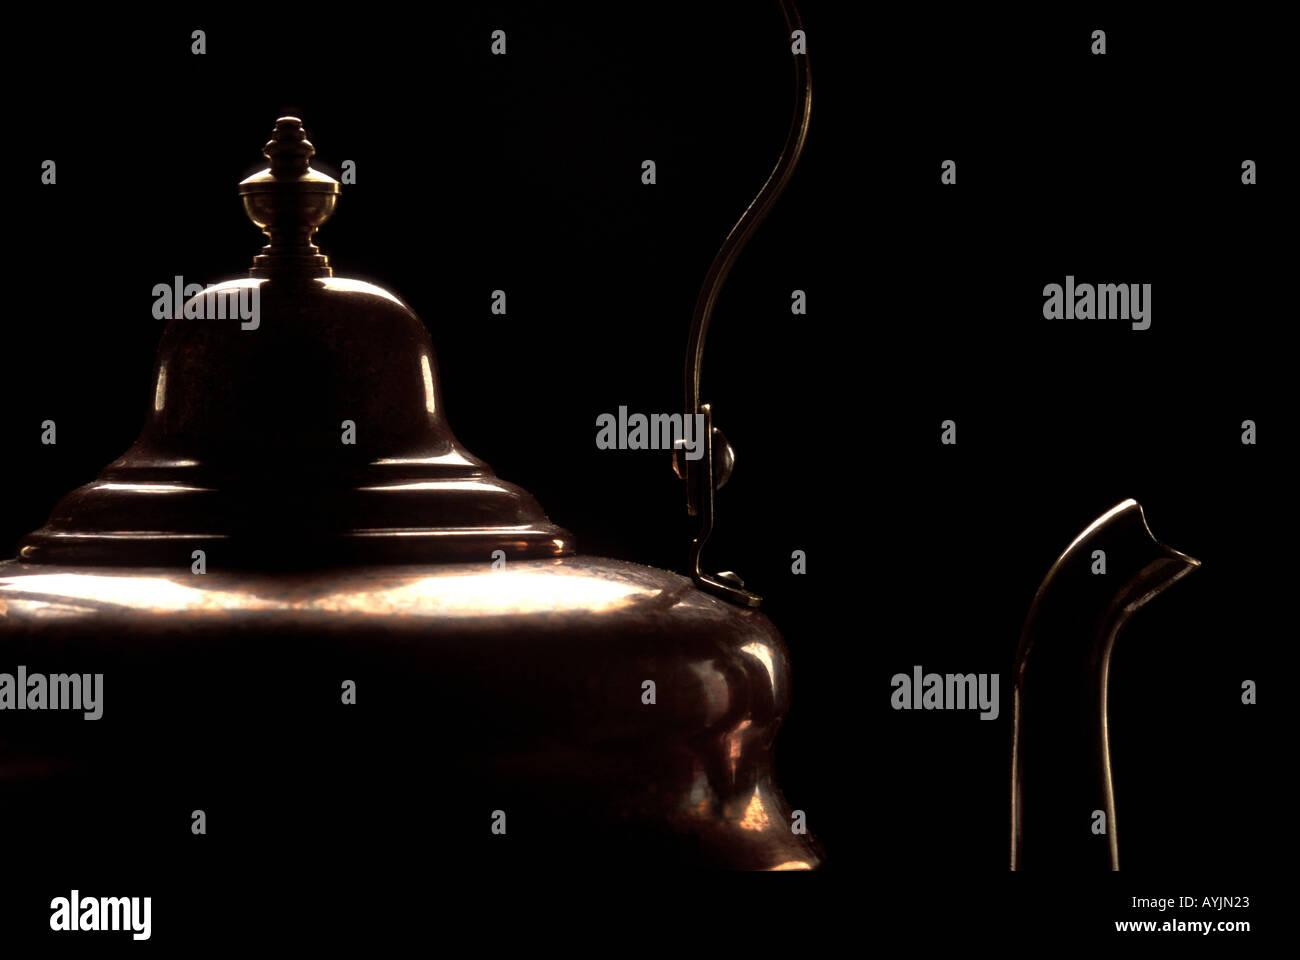 Wasserkessel Stock Photos & Wasserkessel Stock Images - Alamy